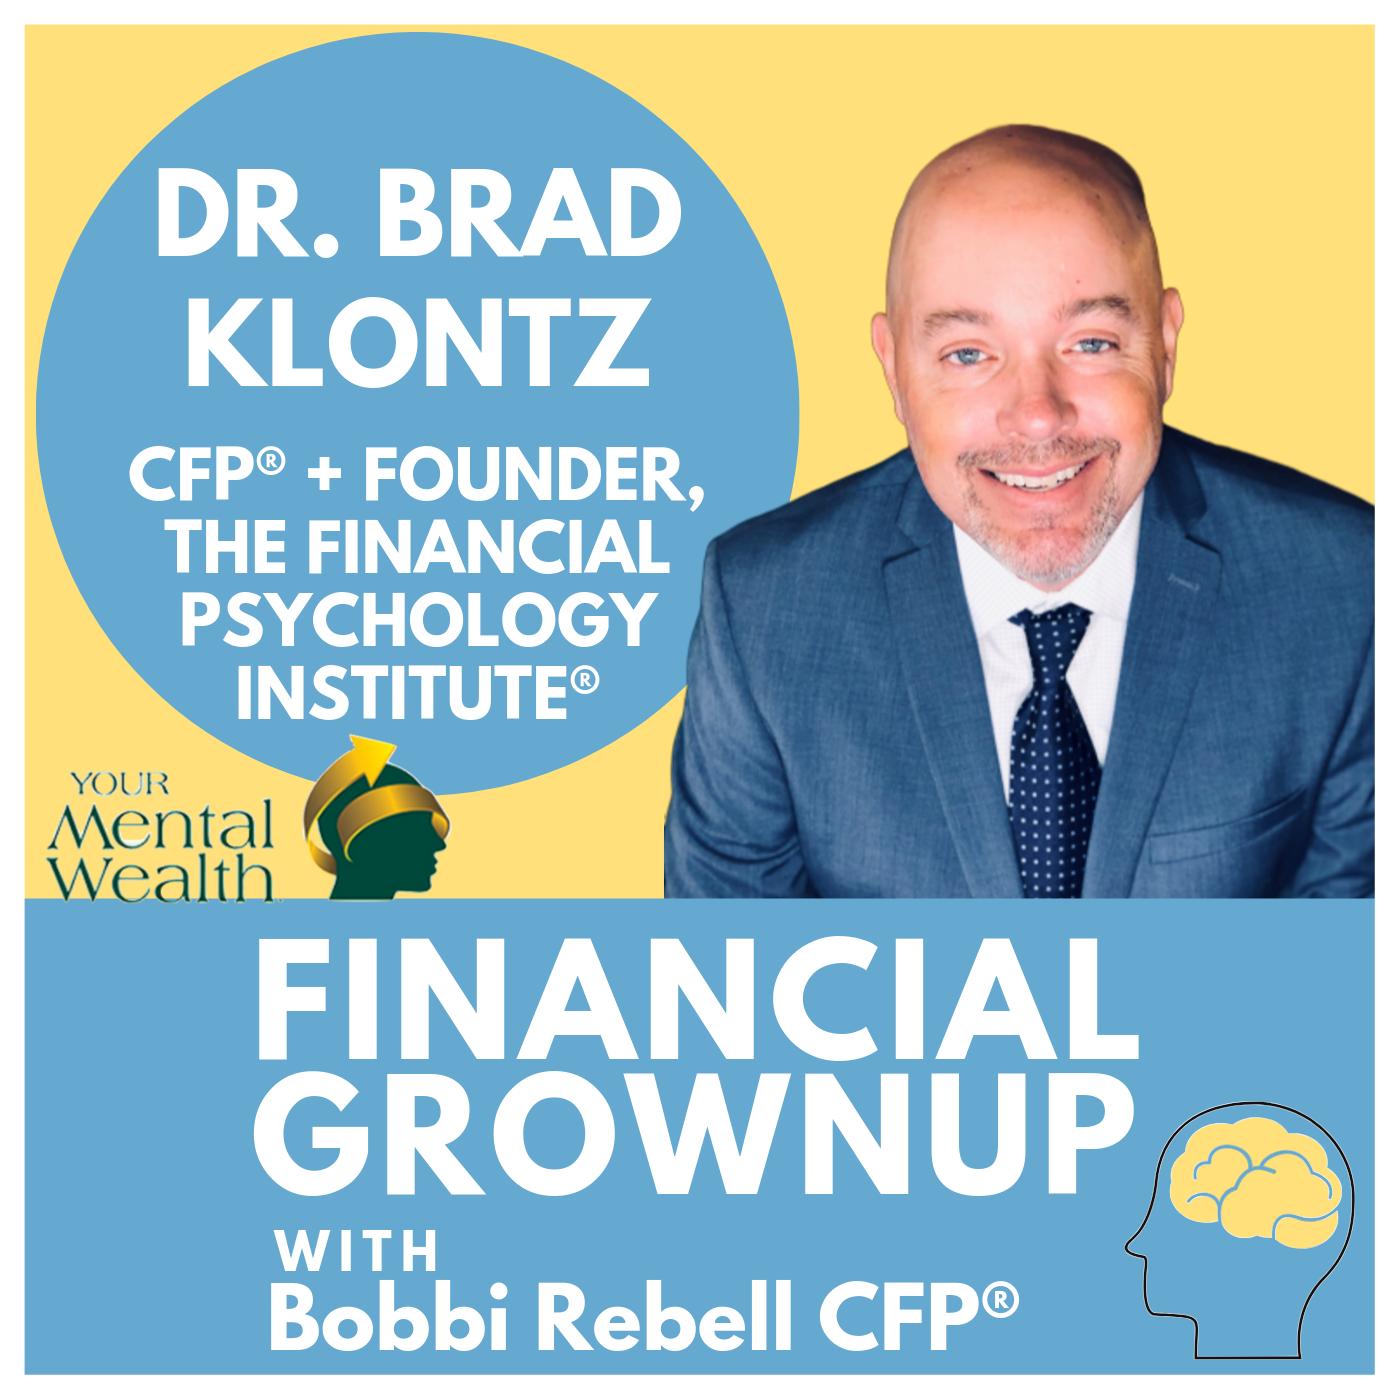 Dr Brad Klontz Instagram